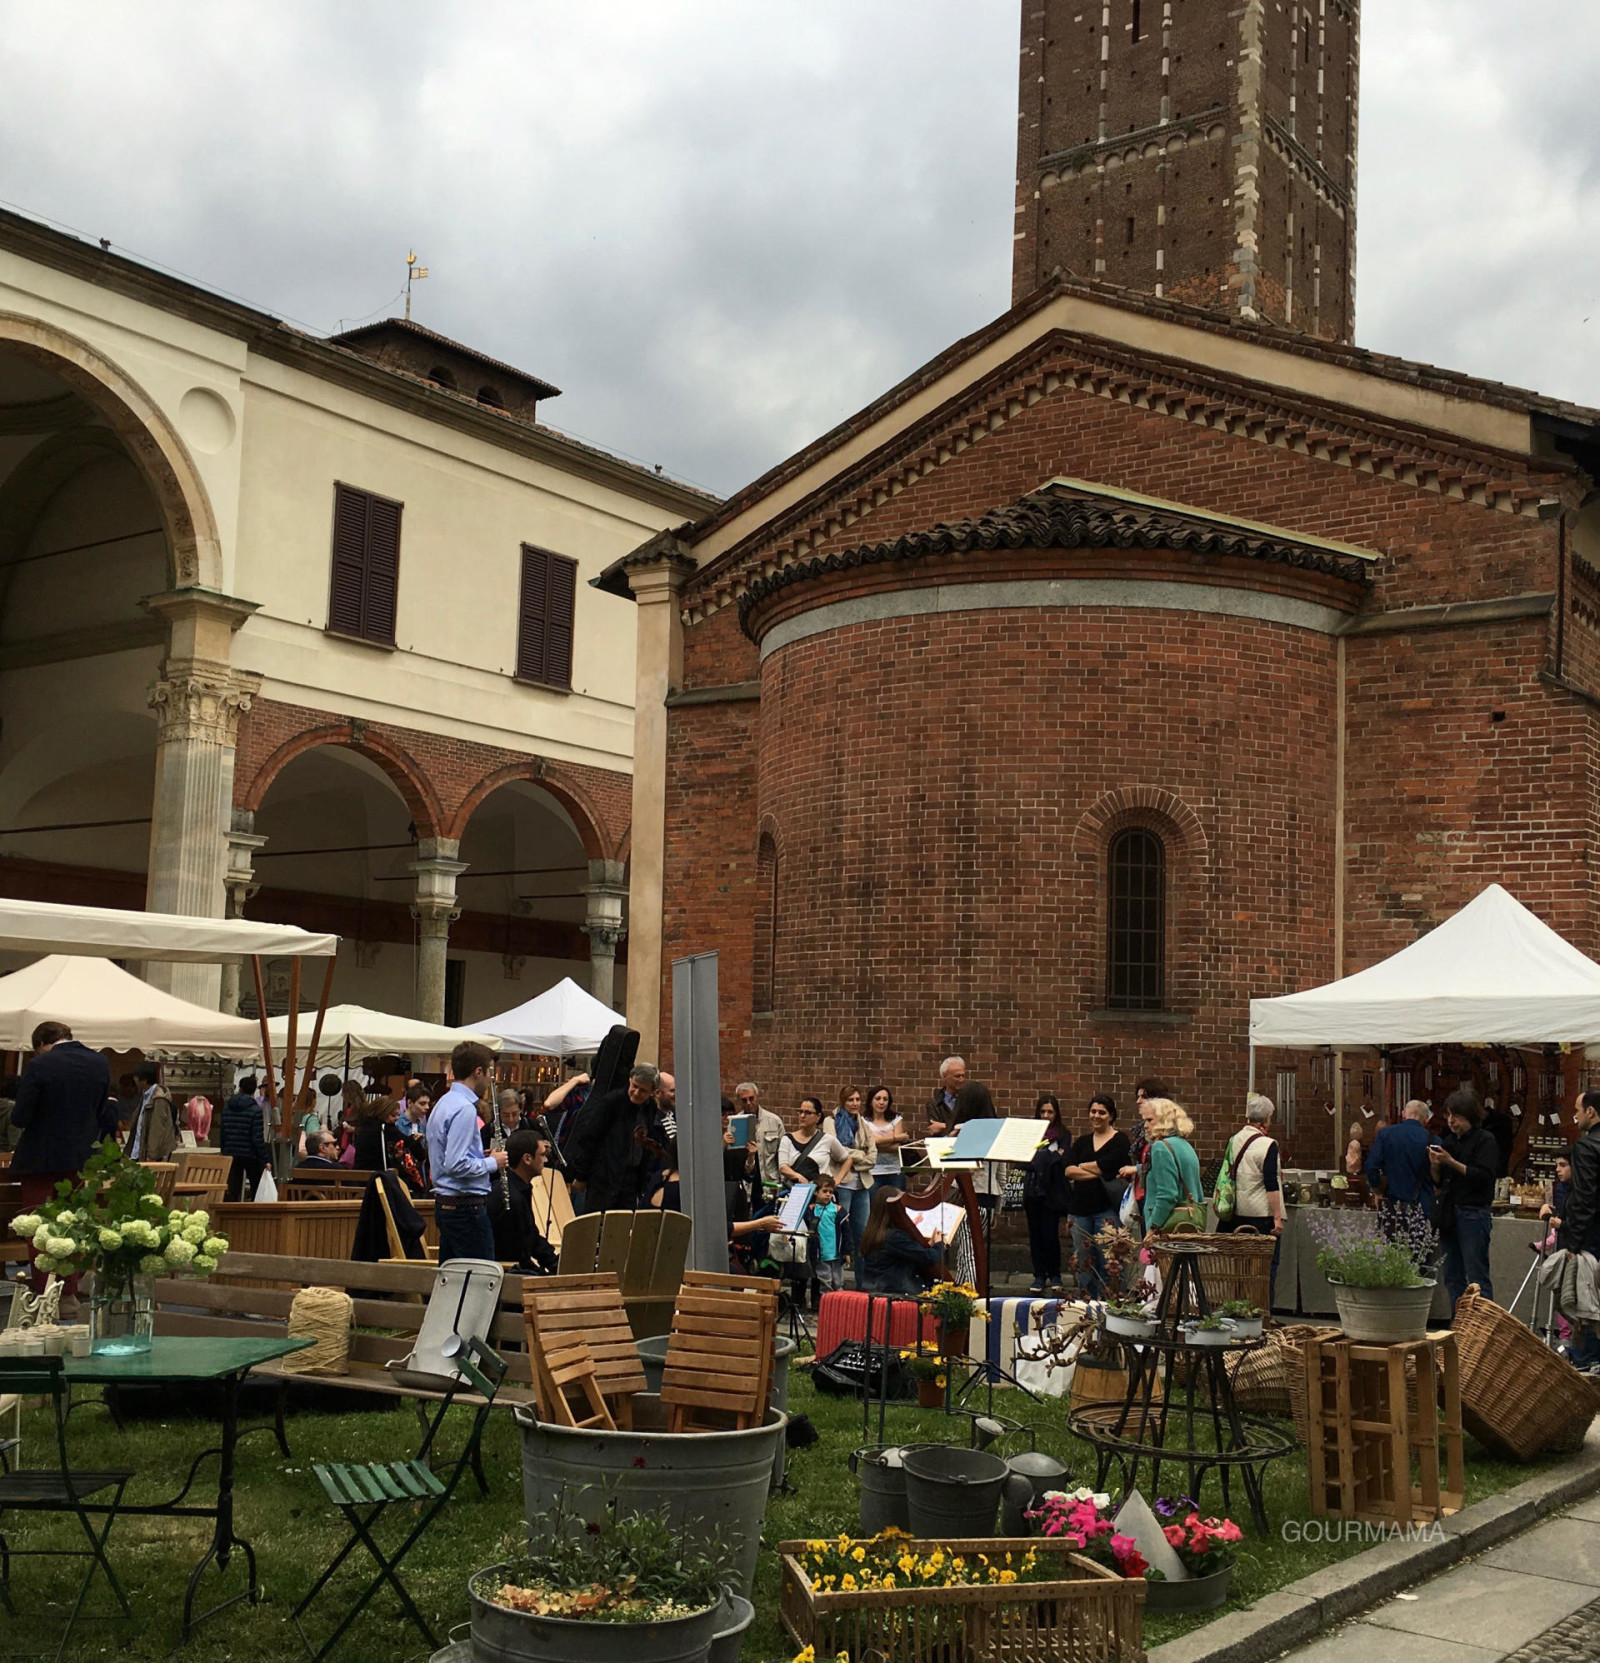 Flora et decora Basilica di Sant'Ambrogio, gourmama